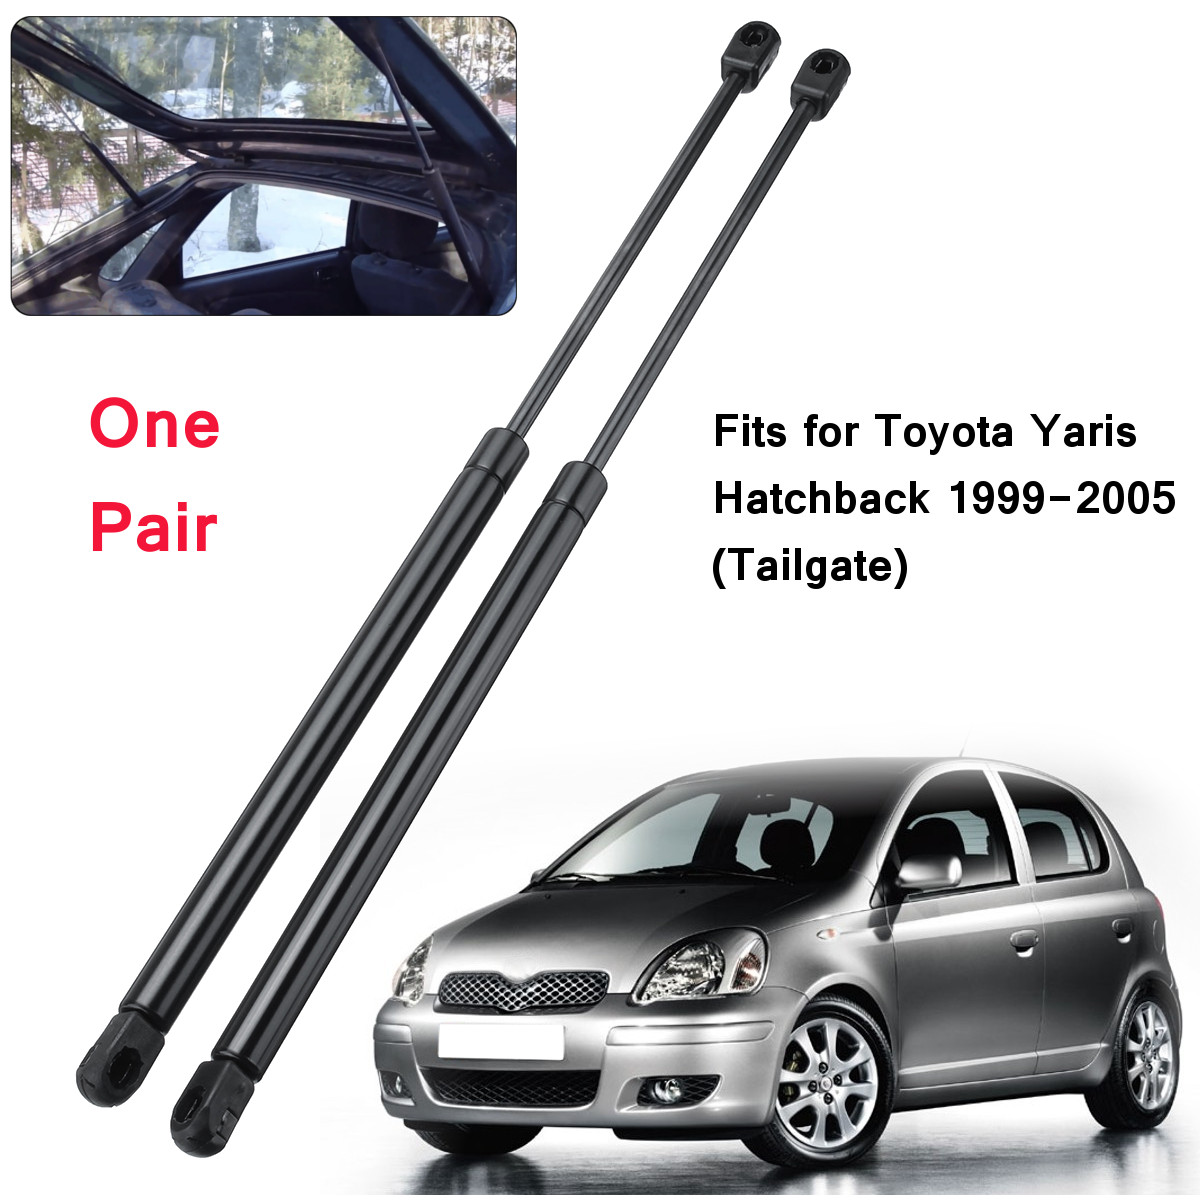 2pcs 트렁크 리어 테일 게이트 부츠 가스 스트럿츠 리프트 서포트 6895009110 For Toyota Yaris Hatchback 1999 2000 2001 2002 2003 2004 2005